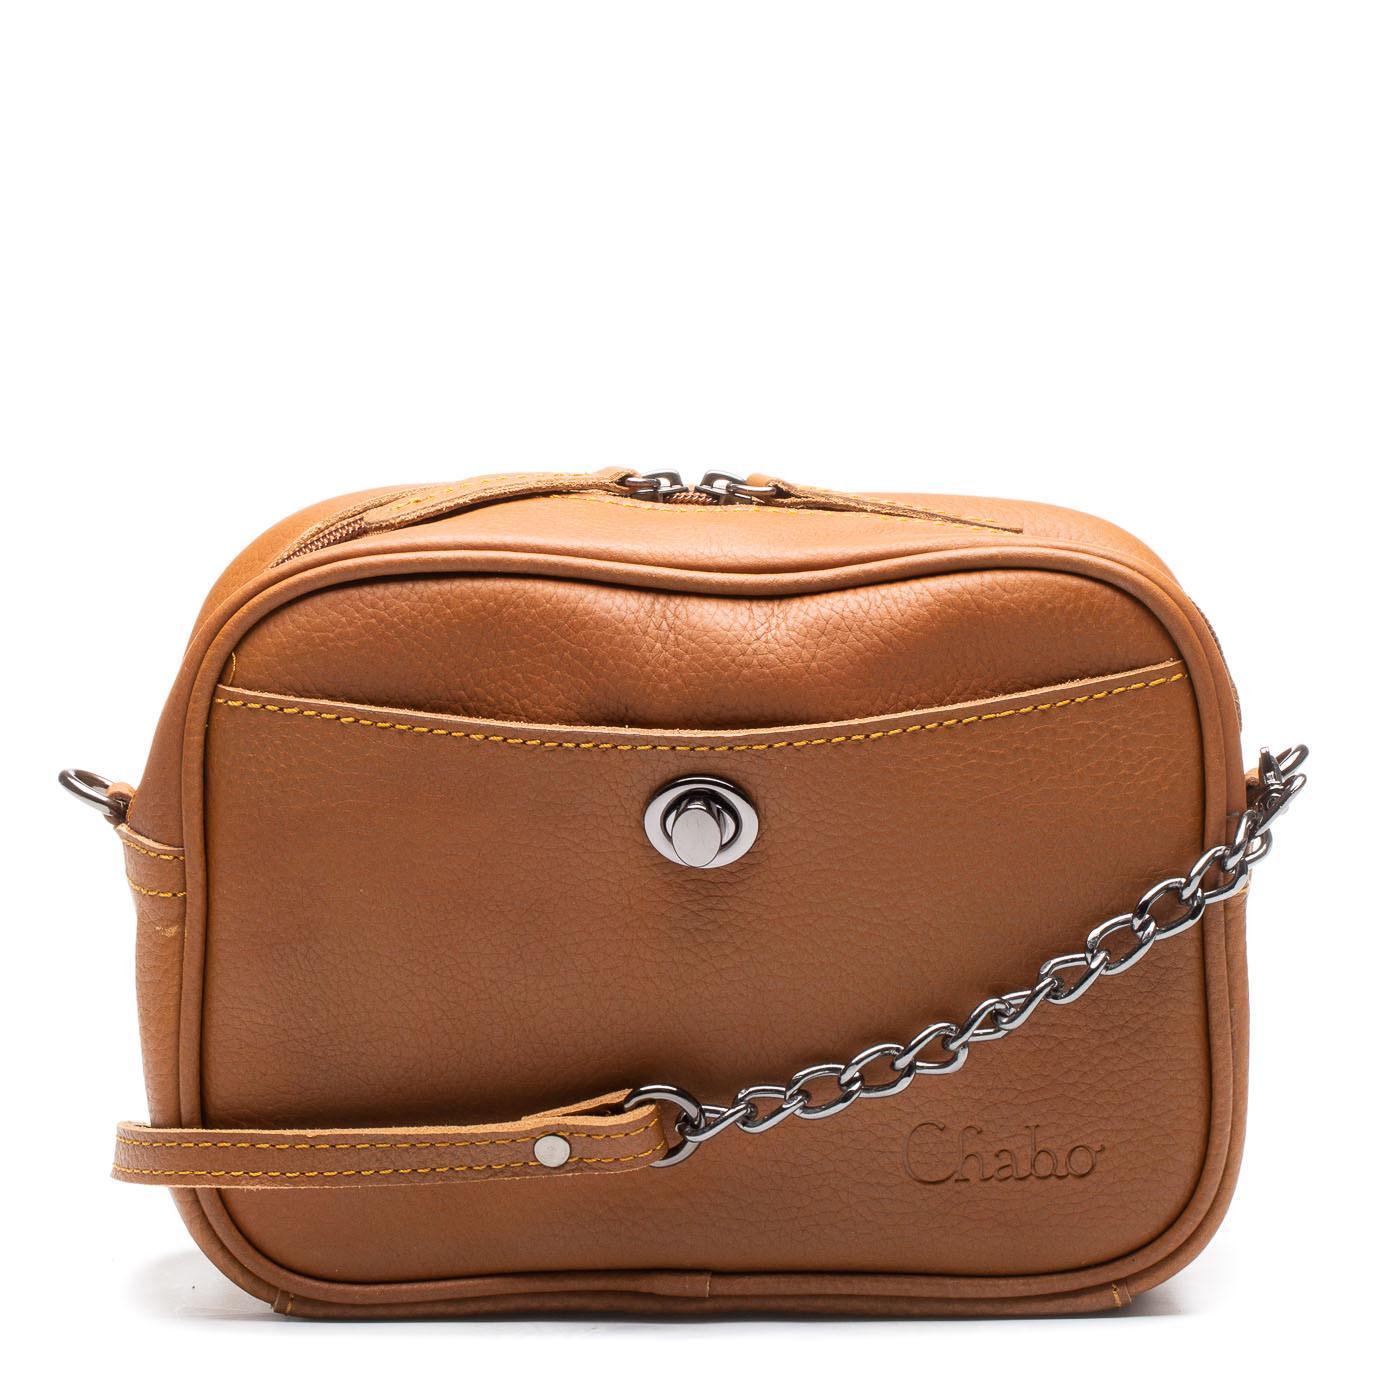 Chabo Bags Coco sac besace 8719274533566